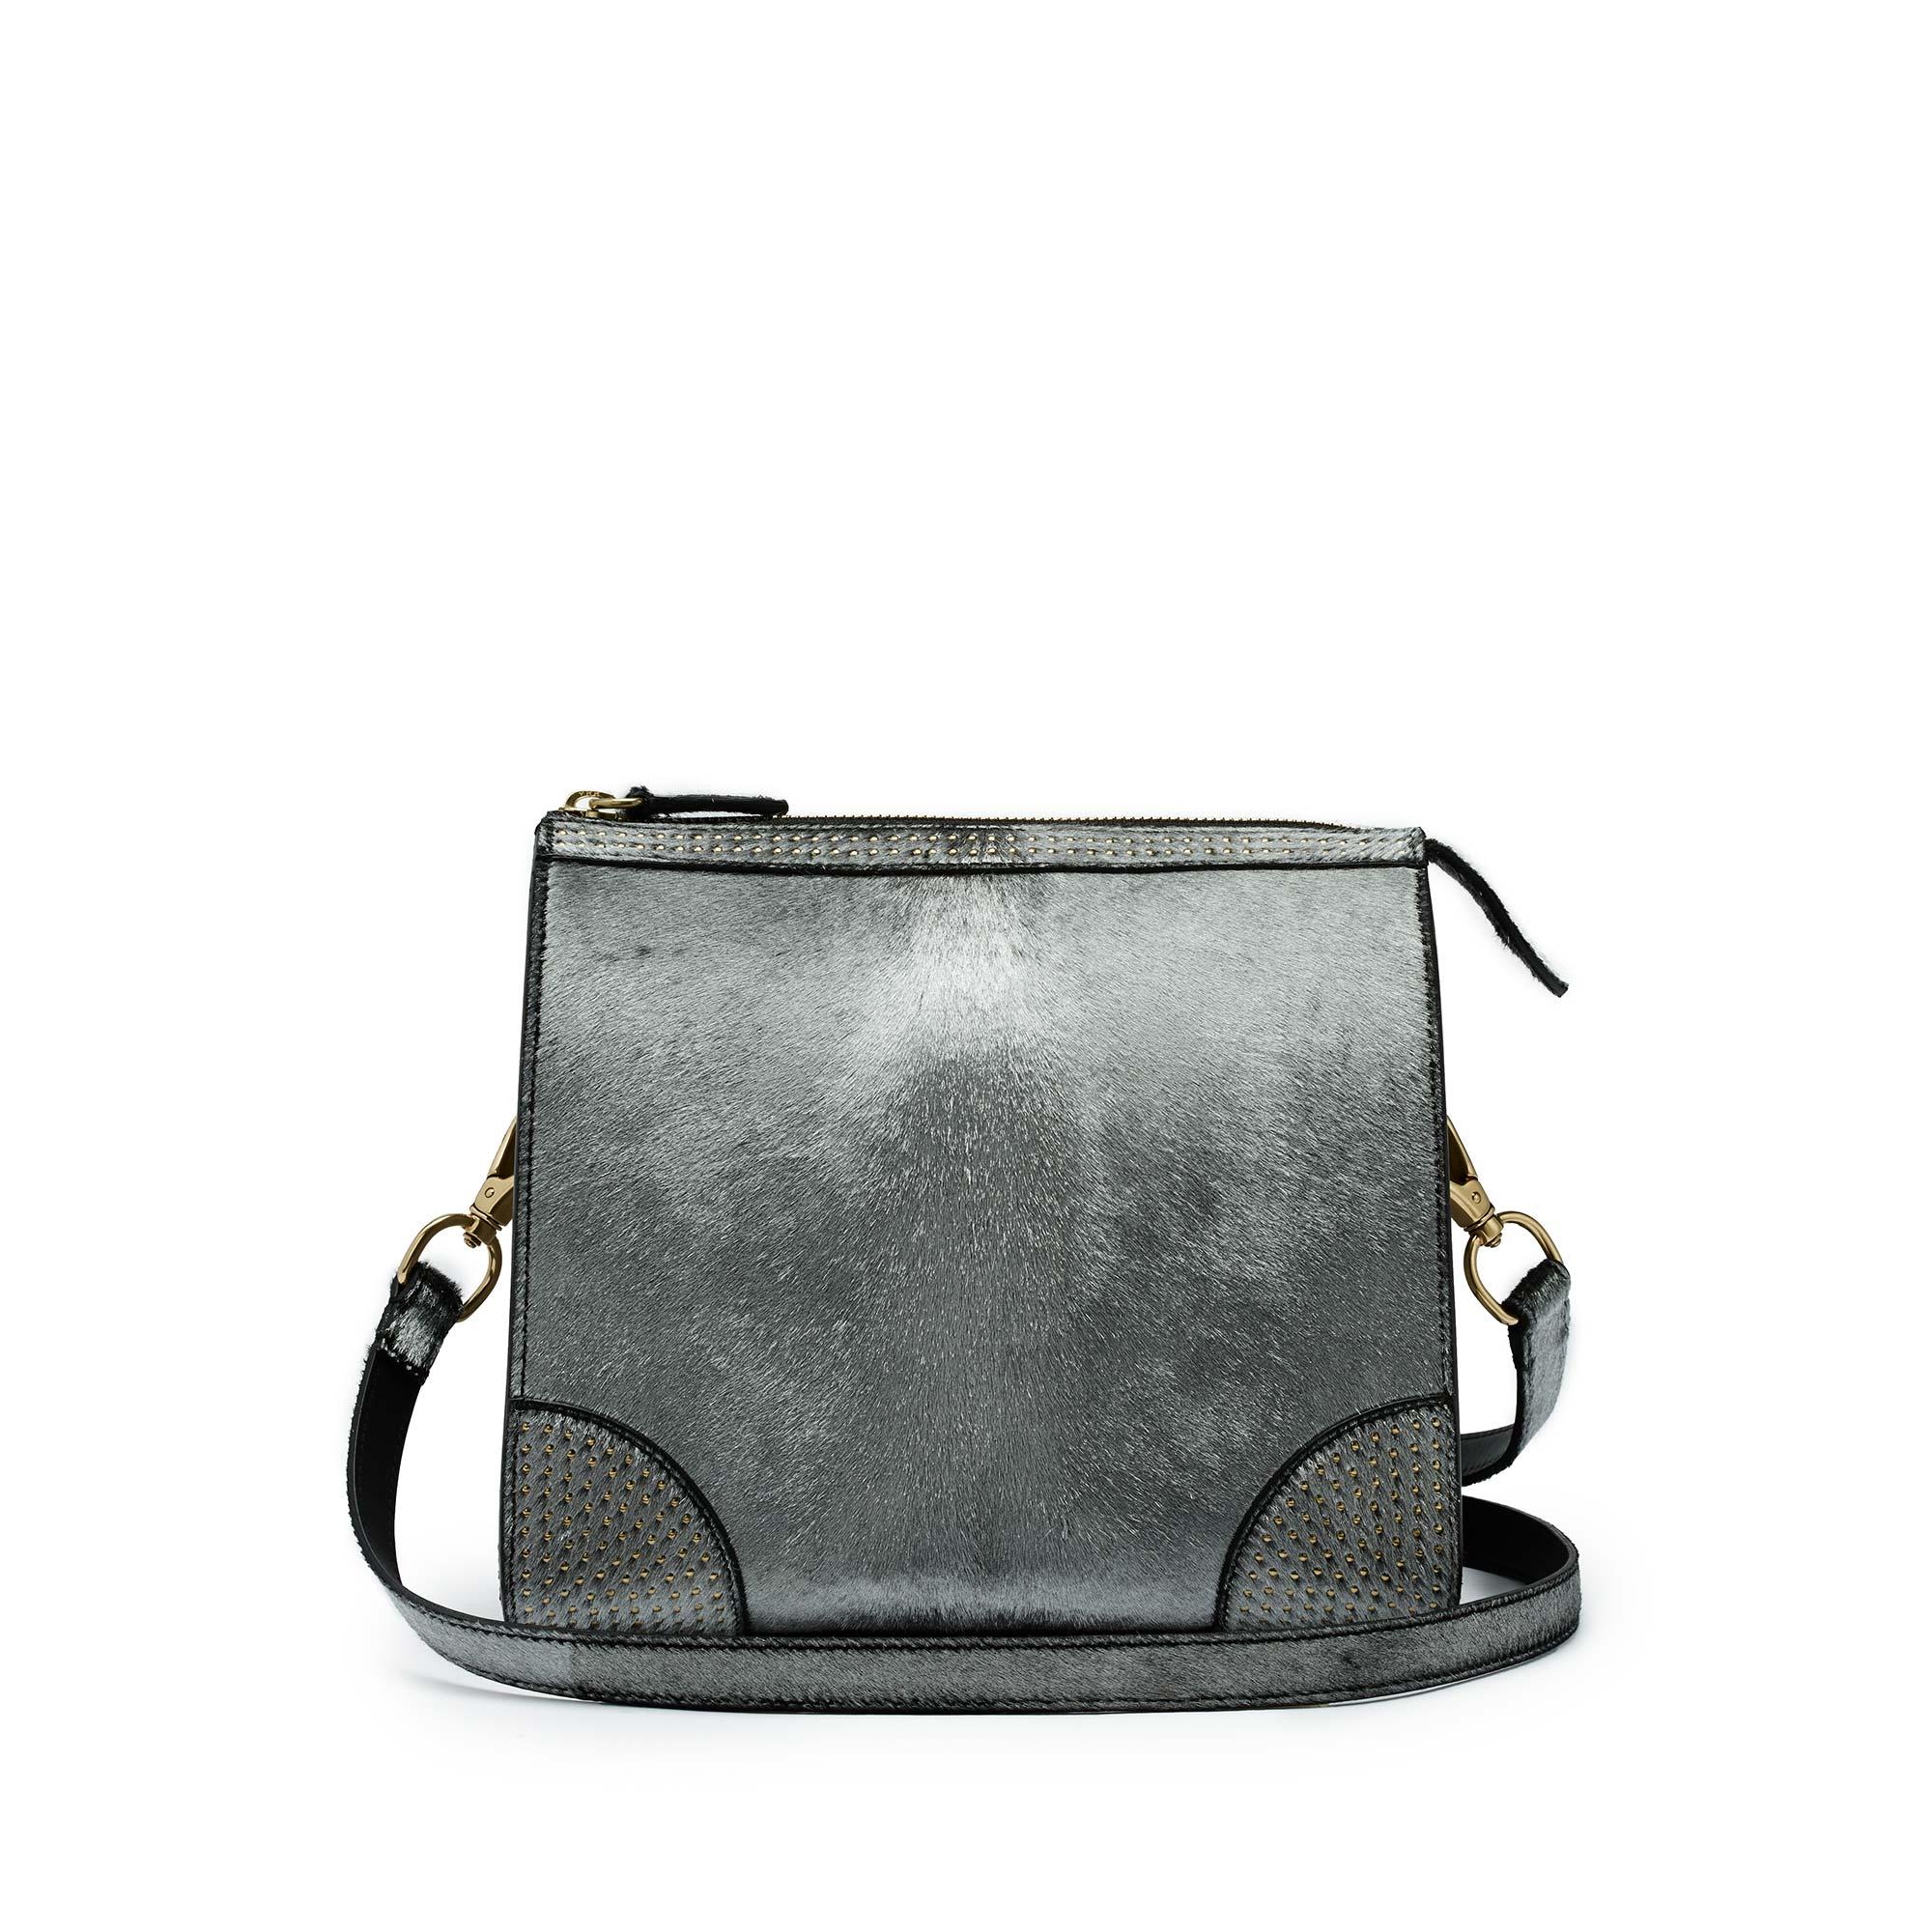 Darcy-Crossbody-silver-haircalf-bag-Bertoni-1949